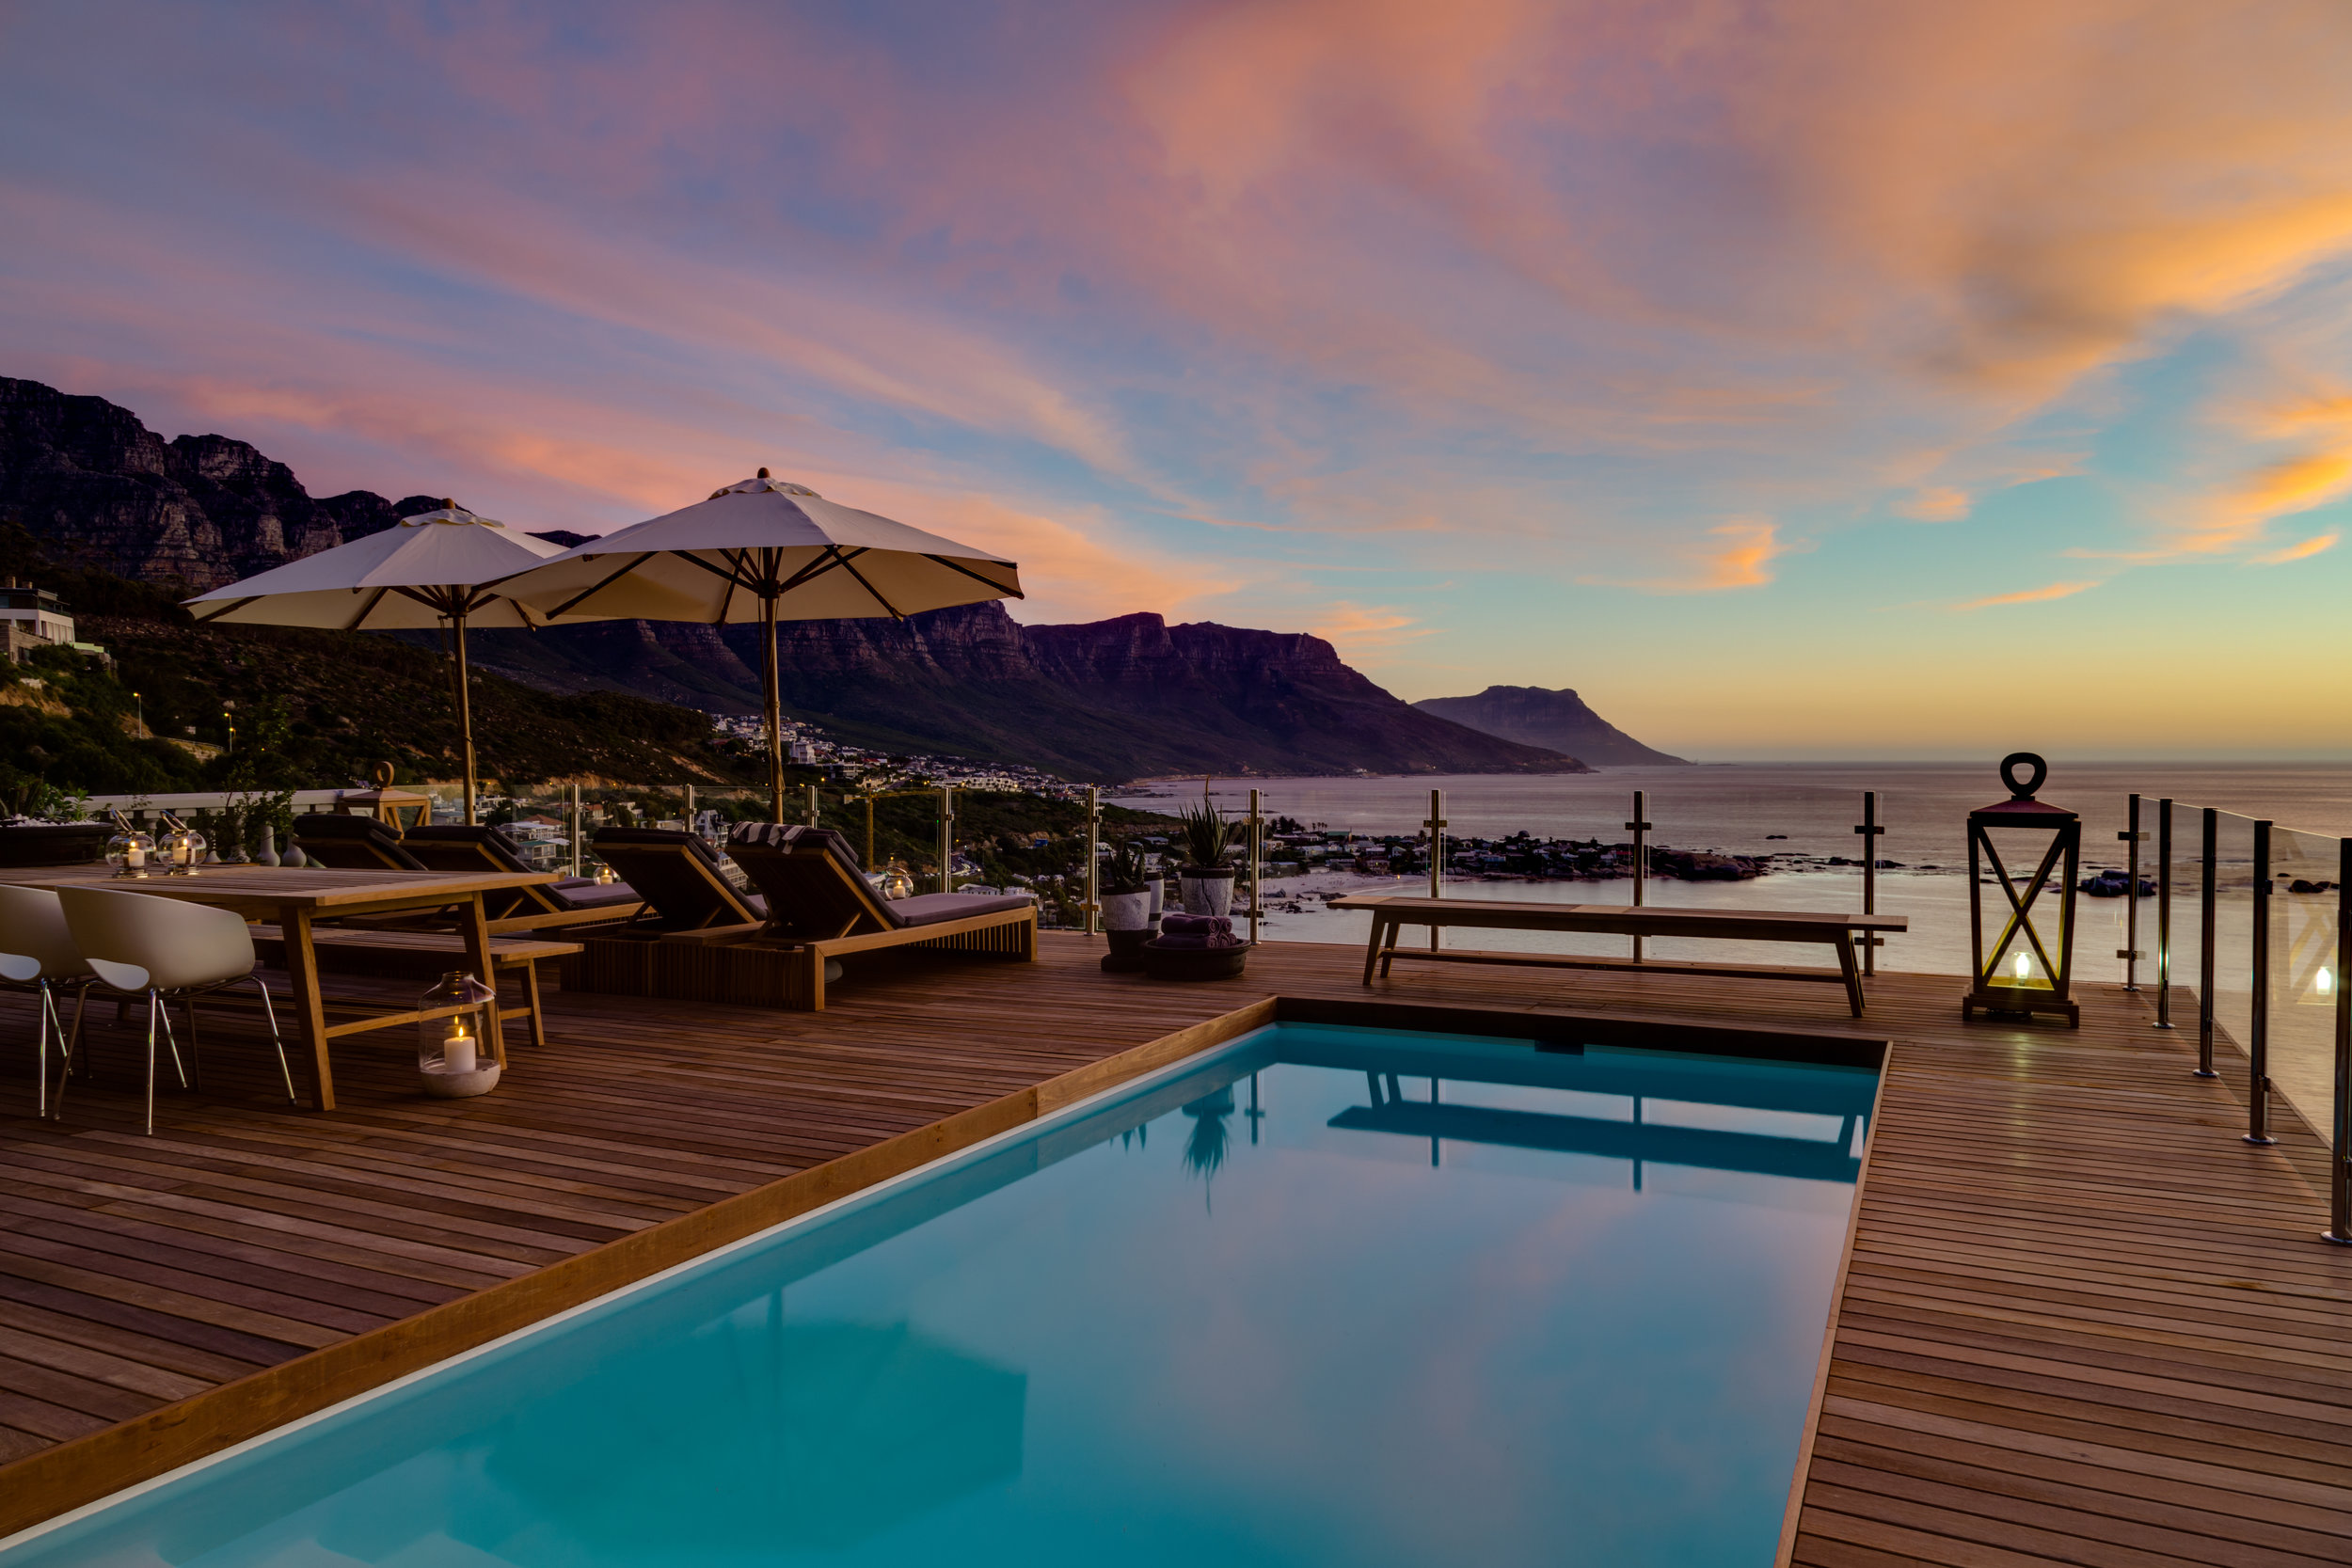 sunset on pool deck 2.jpg